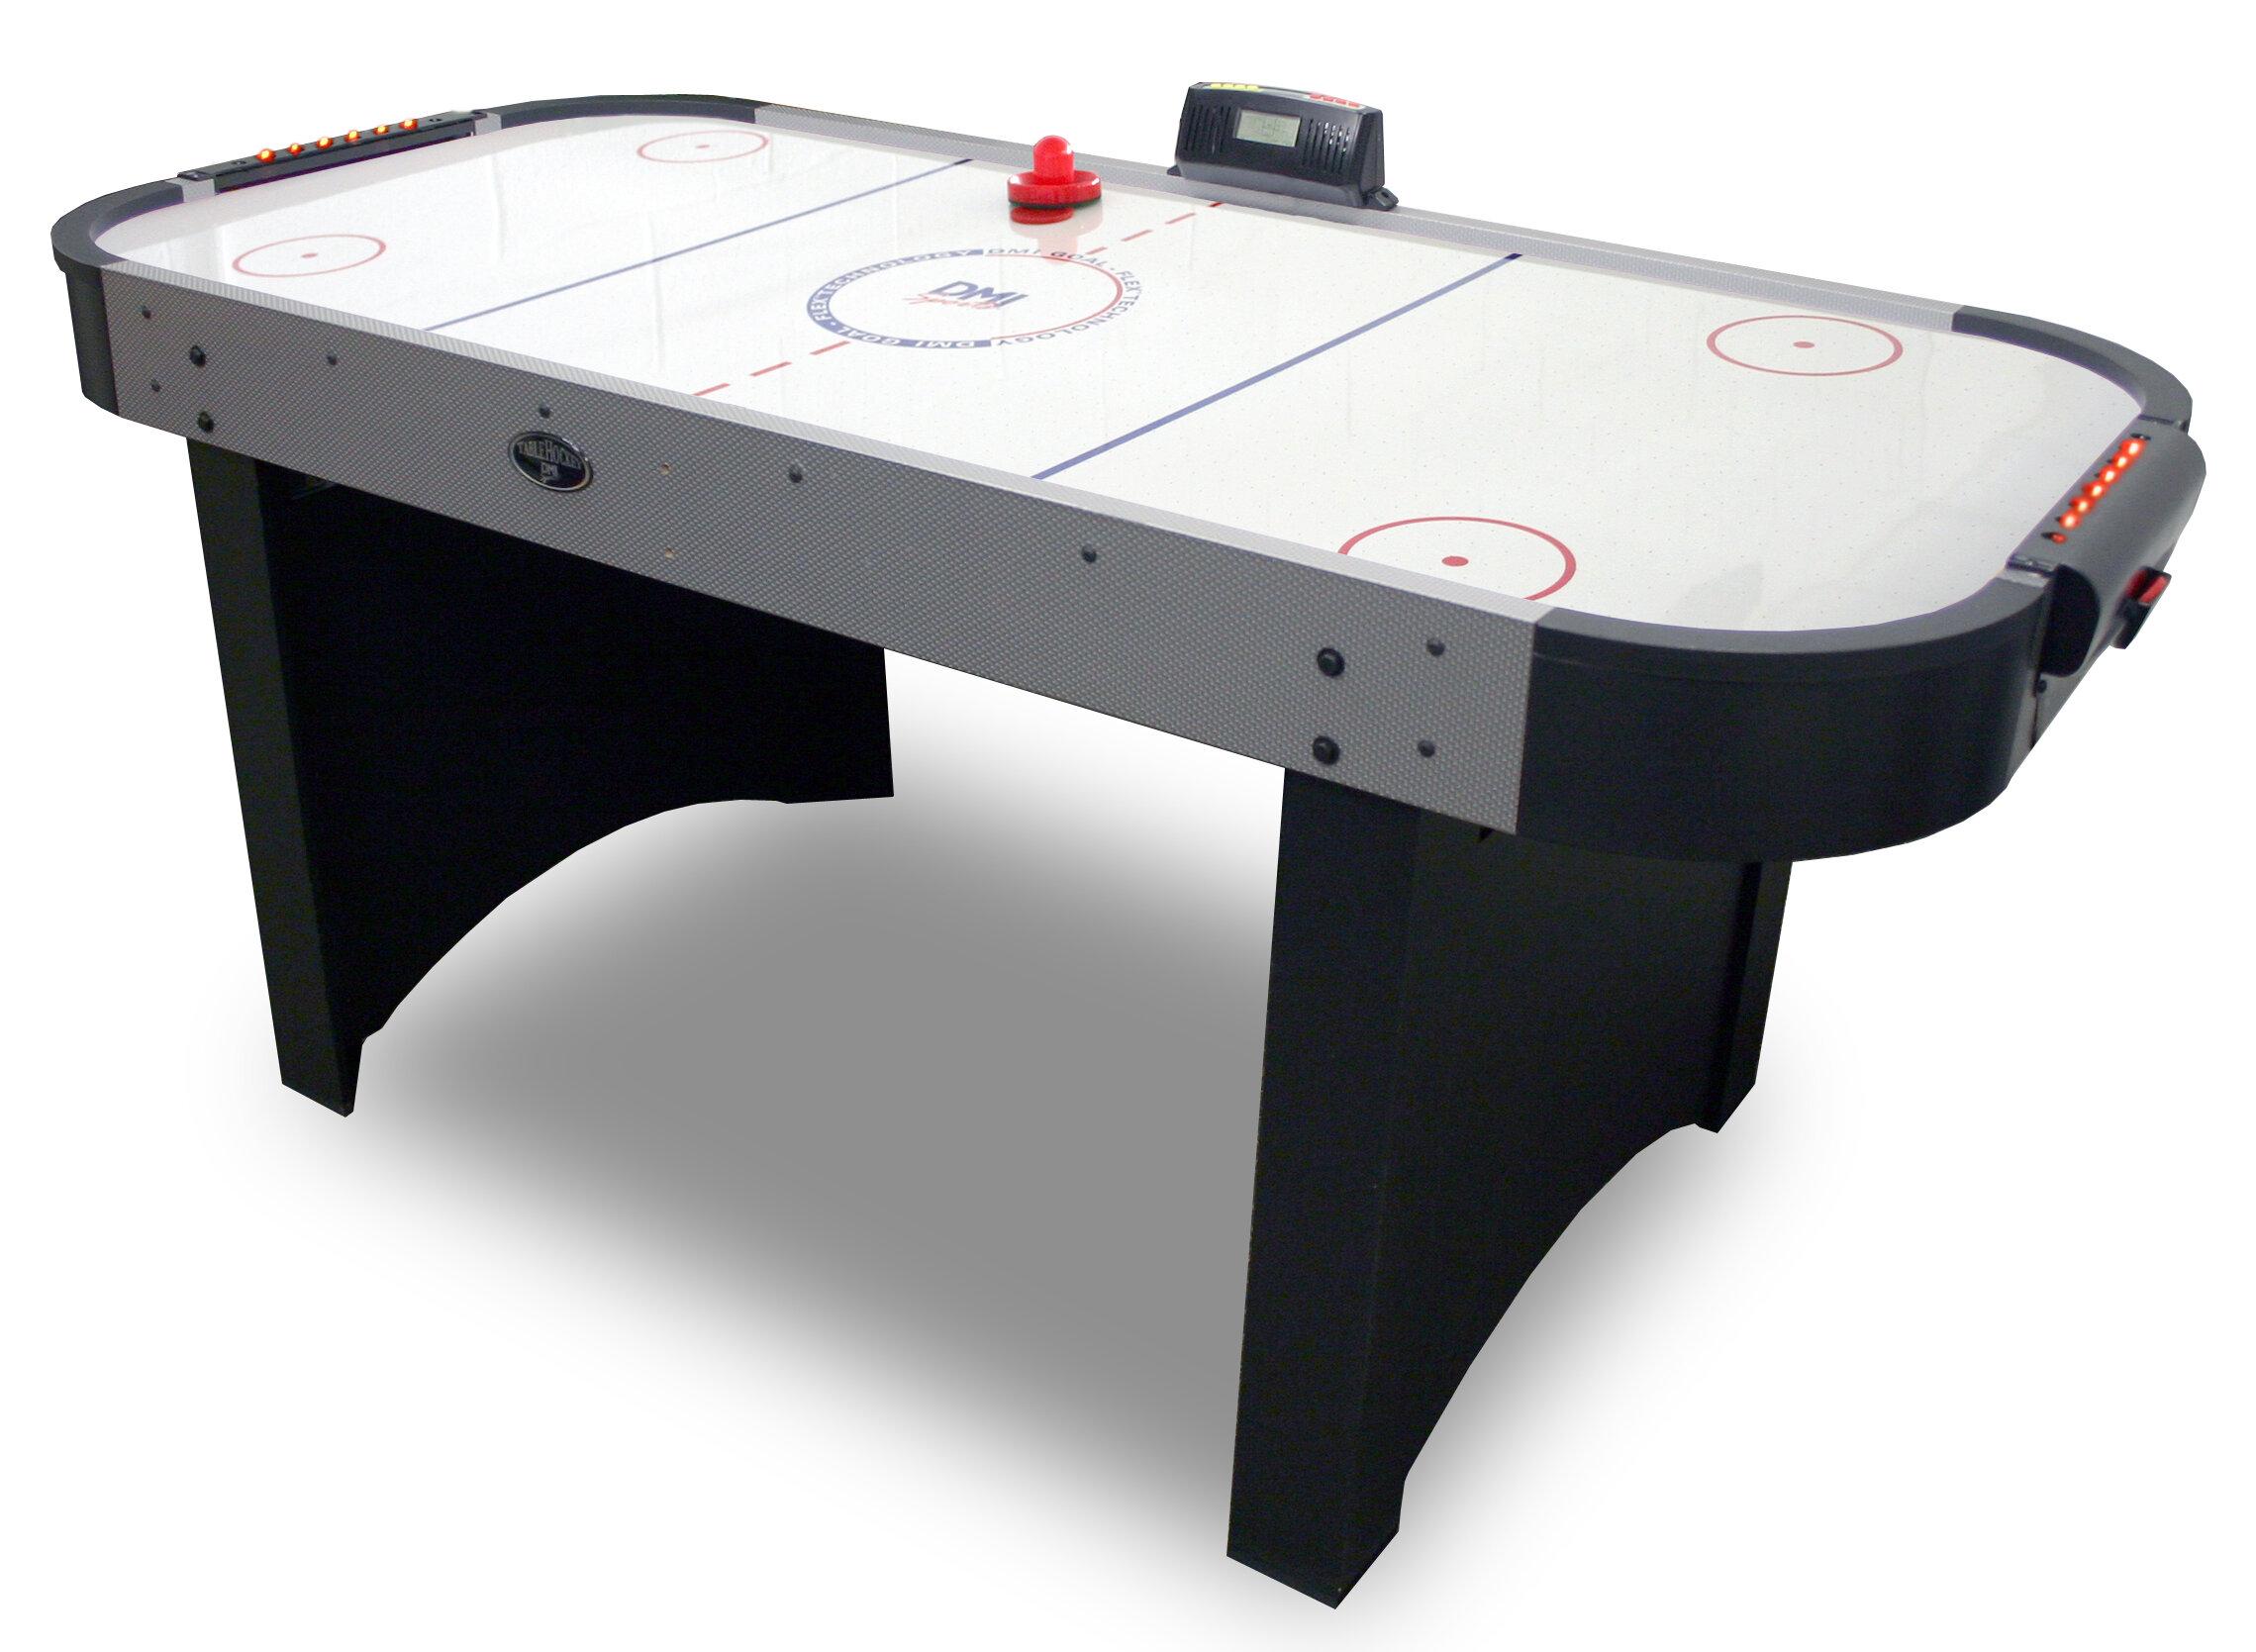 Verus Sports 6u0027 Air Hockey Table With Goal Flex 180 | Wayfair